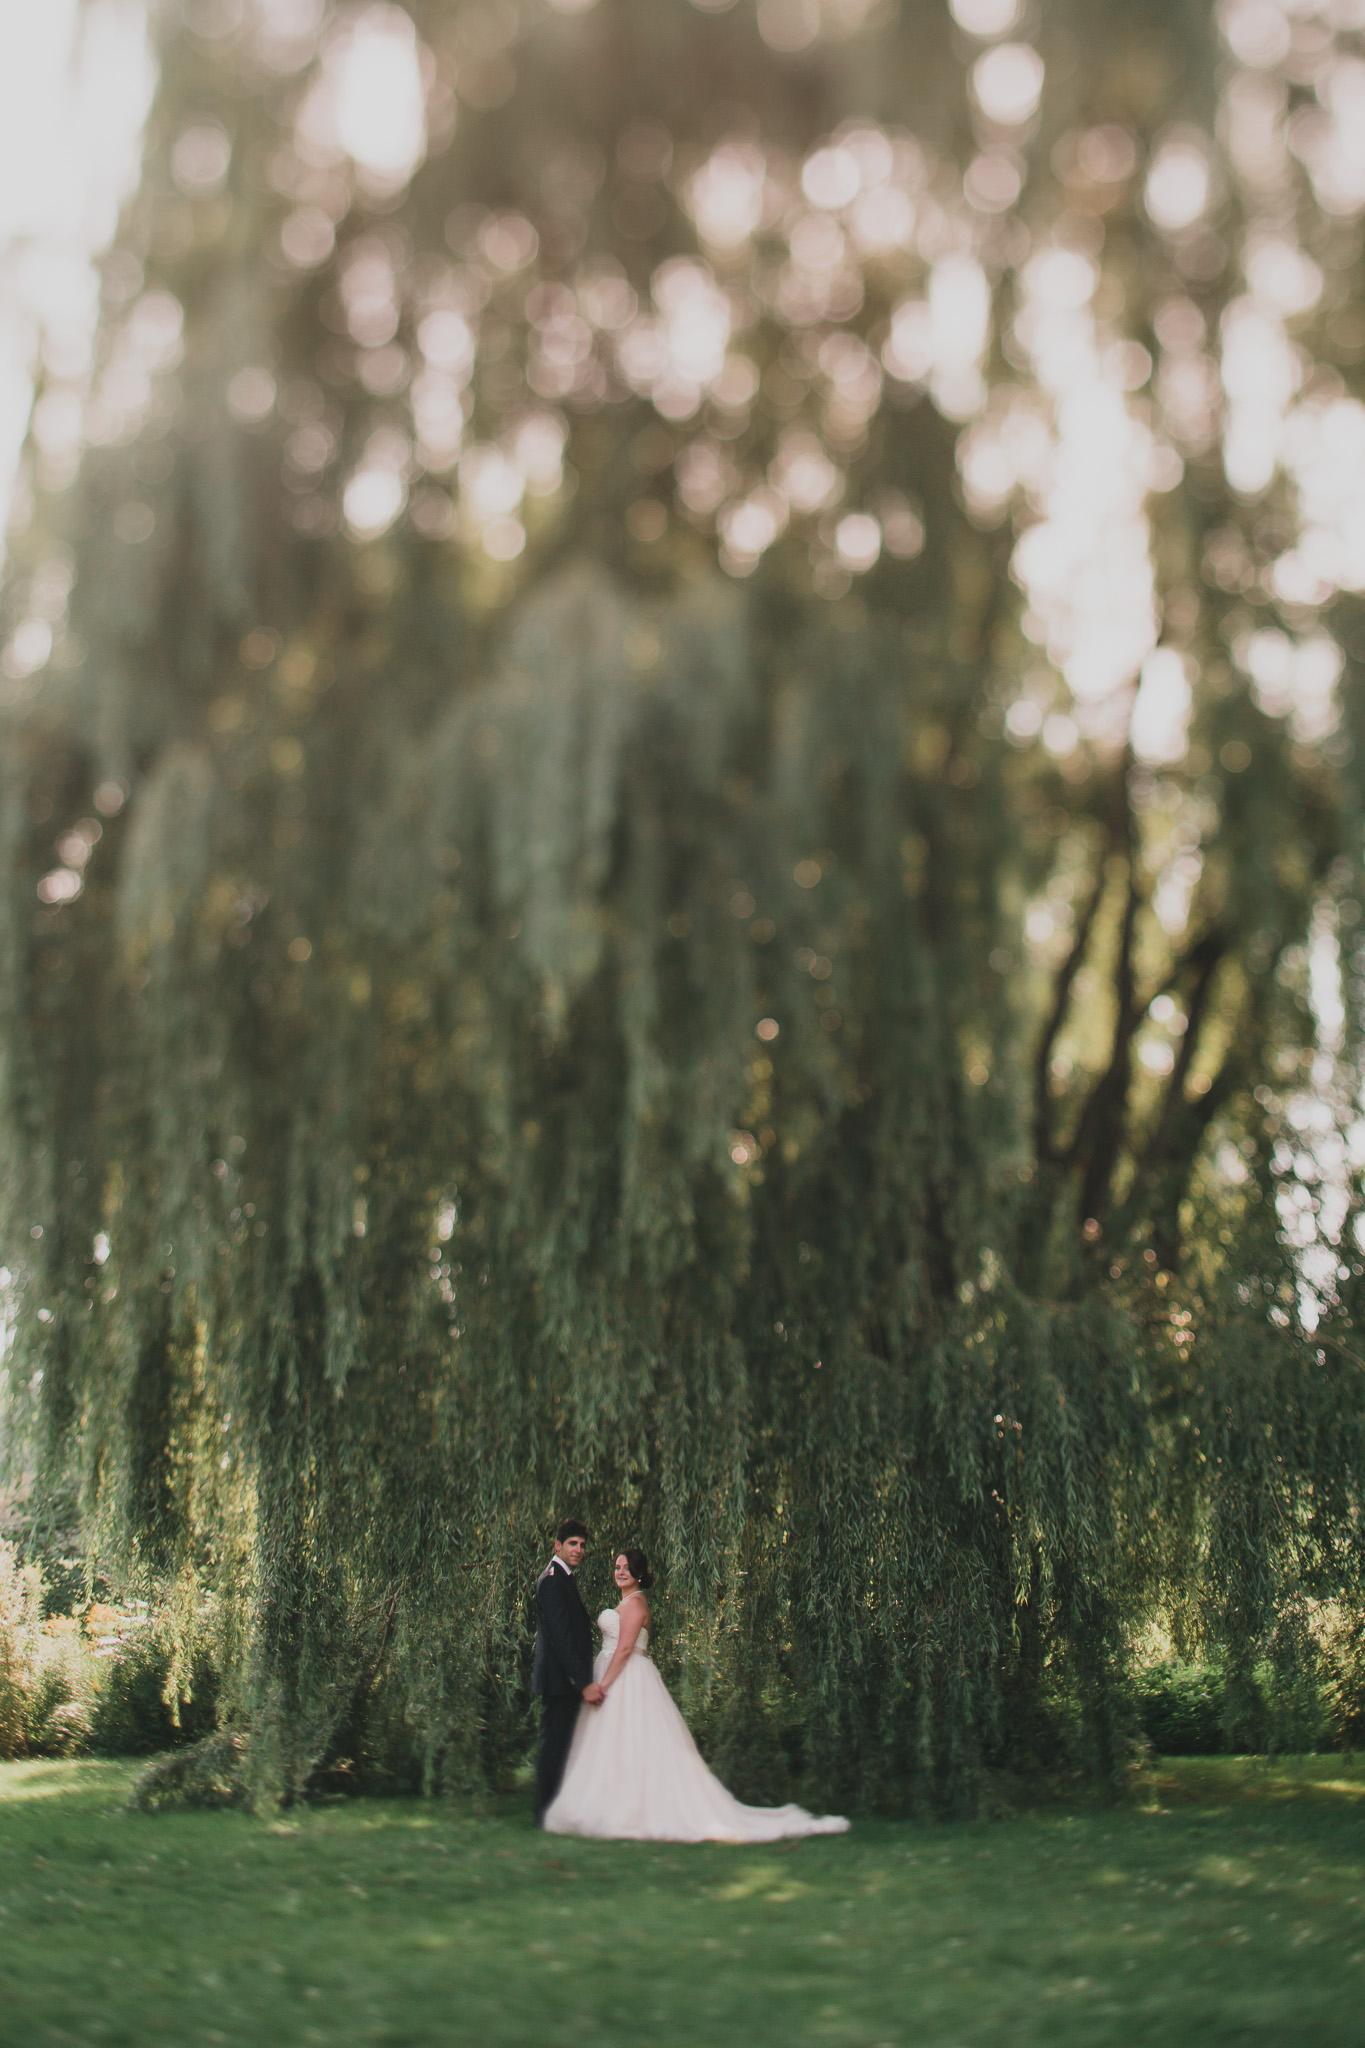 Dow's Lake Wedding Photo locations